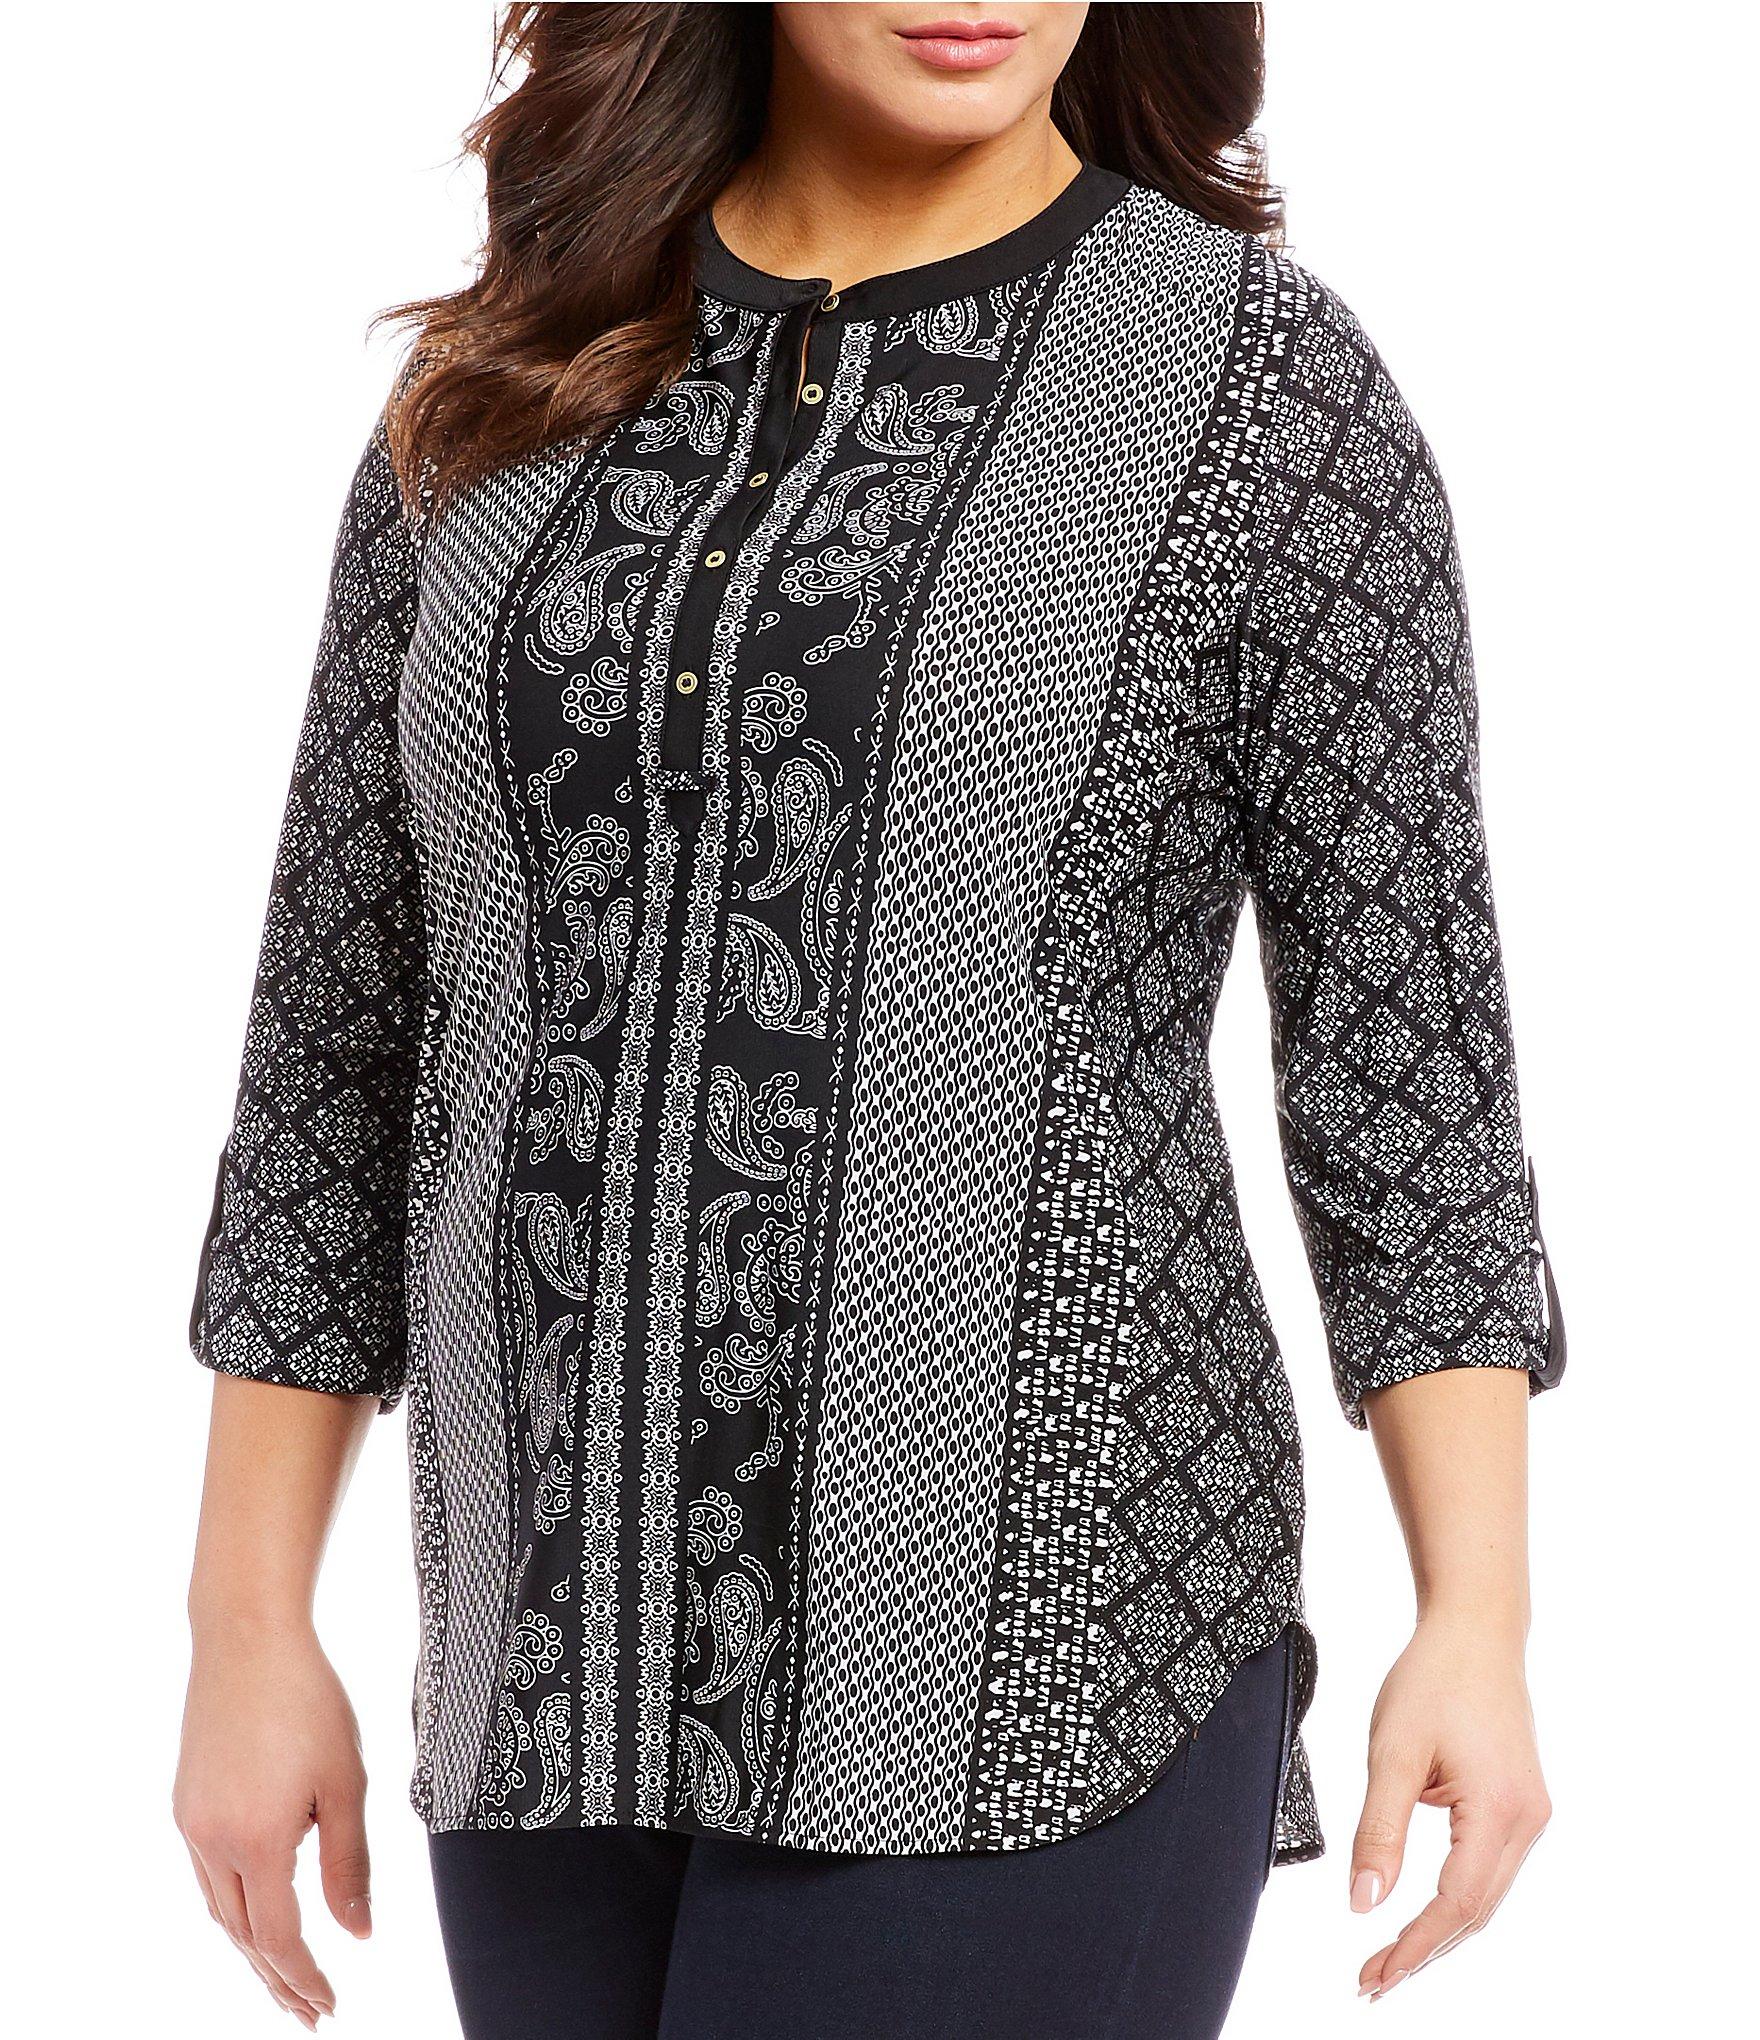 4bb4ed1cefccc Peter Nygard Black Plus-Size Knit Tops   Tees